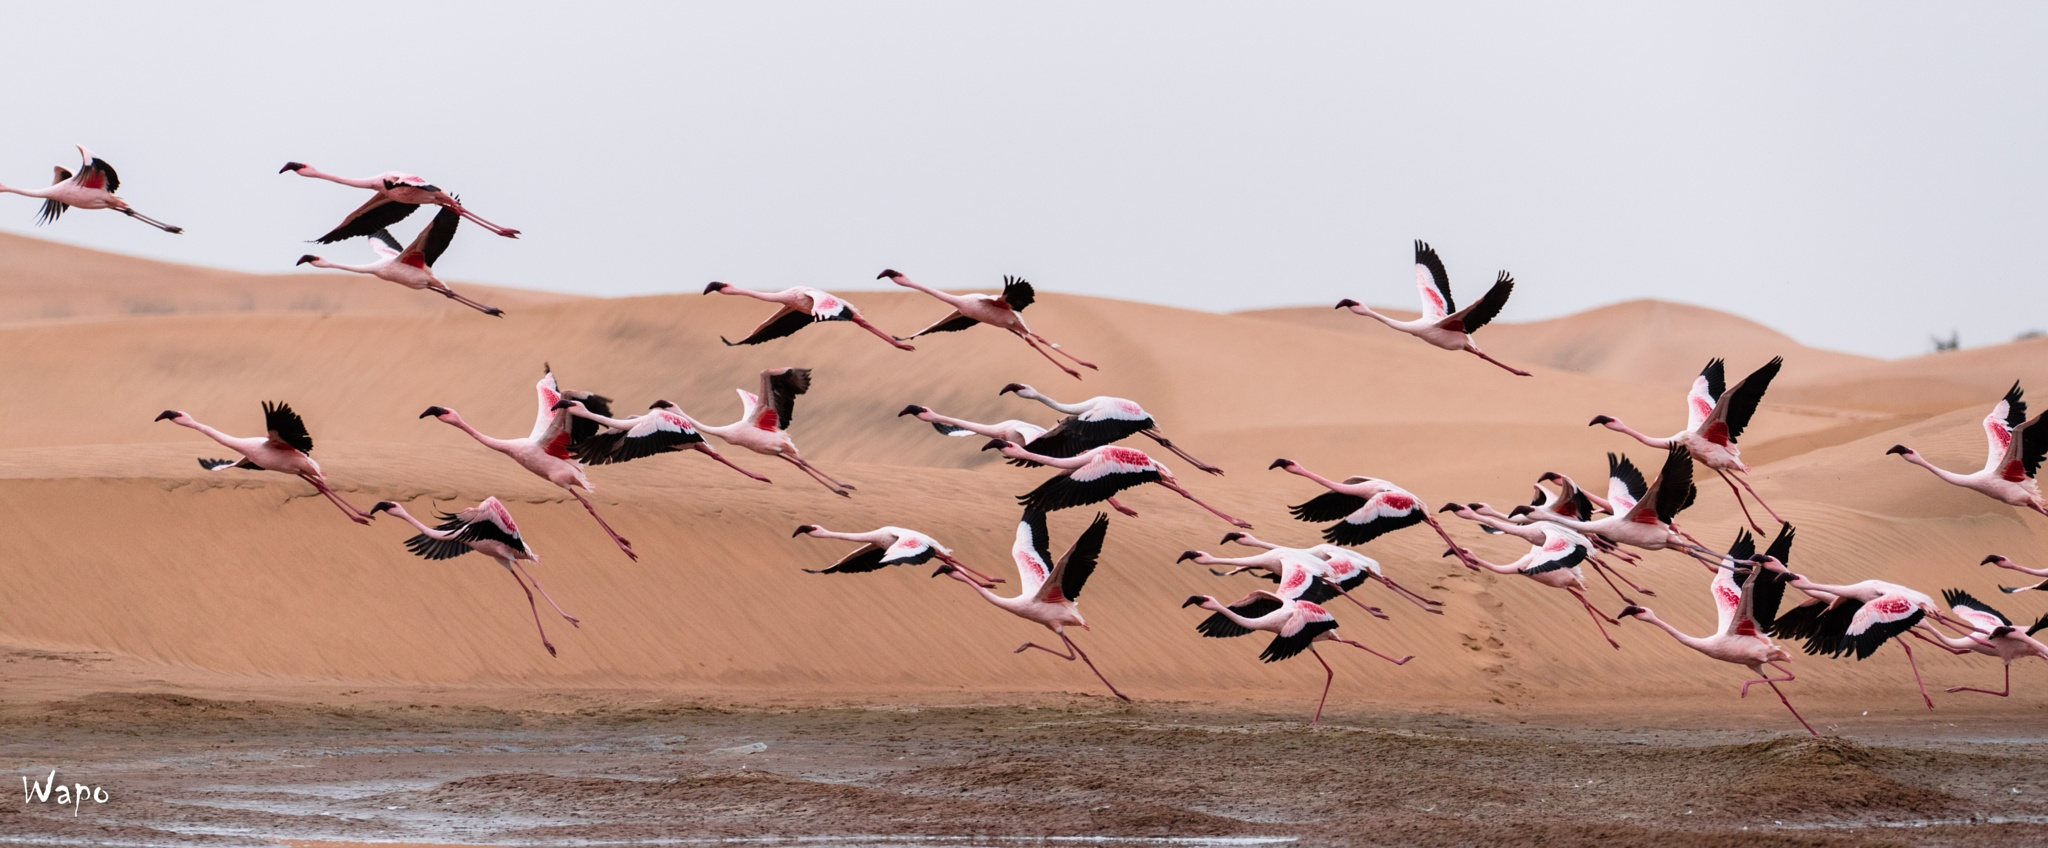 Flamingo's in the desert of Swakopmund by wardpoppe